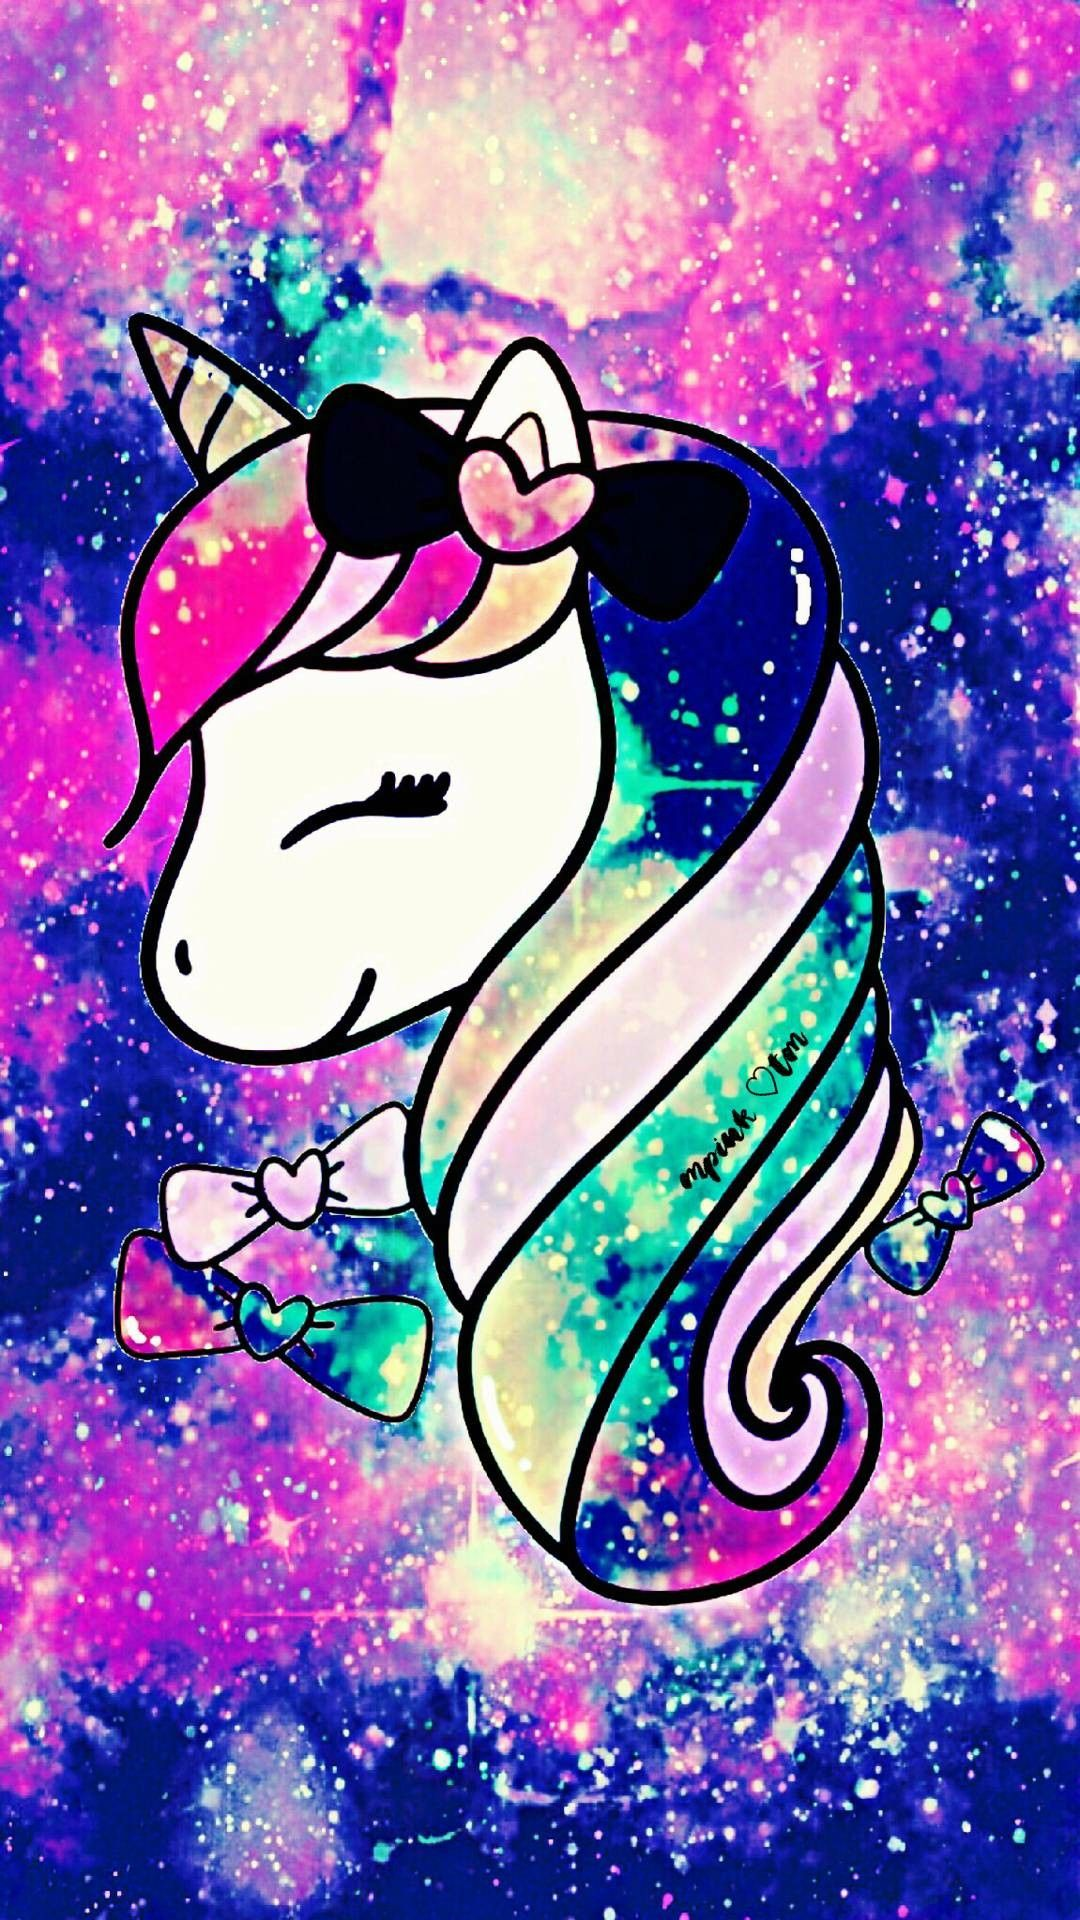 Unicorn Wallpaper For Ipad : unicorn, wallpaper, Unicorn, Wallpaper